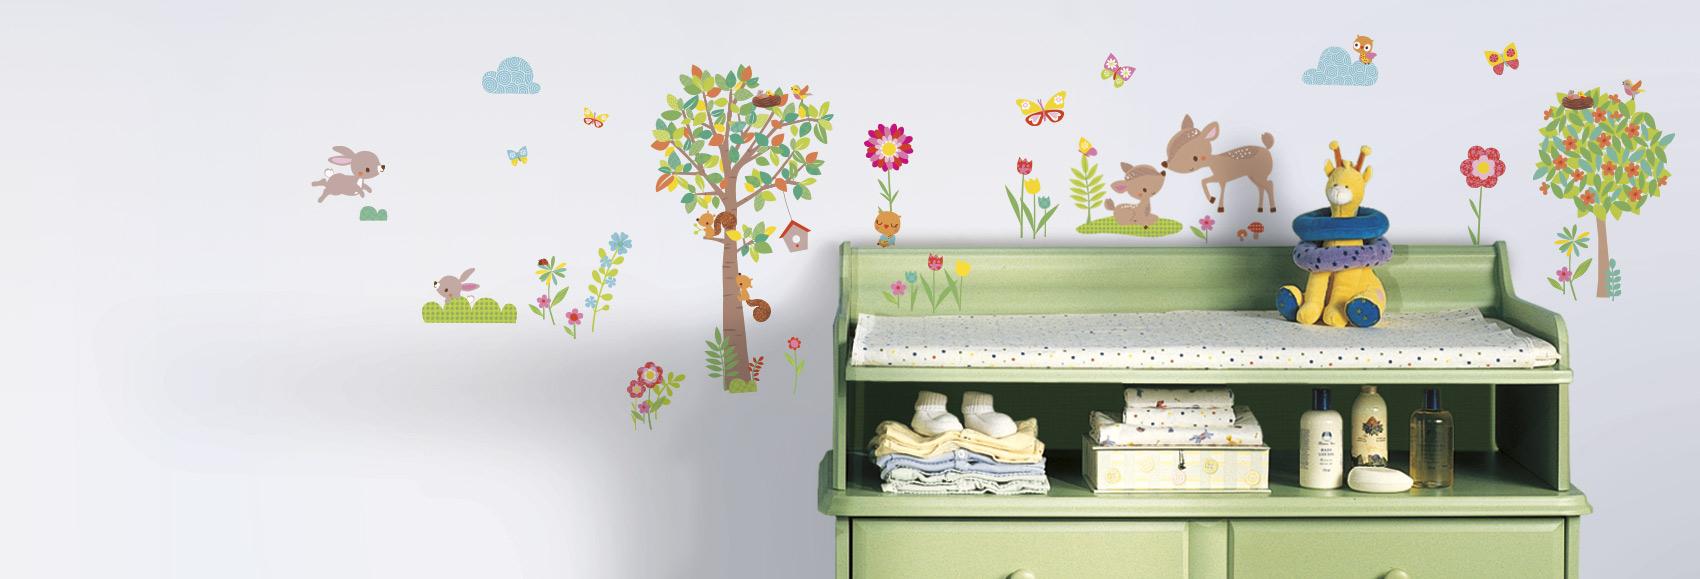 wall decals for nursery nursery wall decals u0026 wall stickers. nursery FTNKMNE